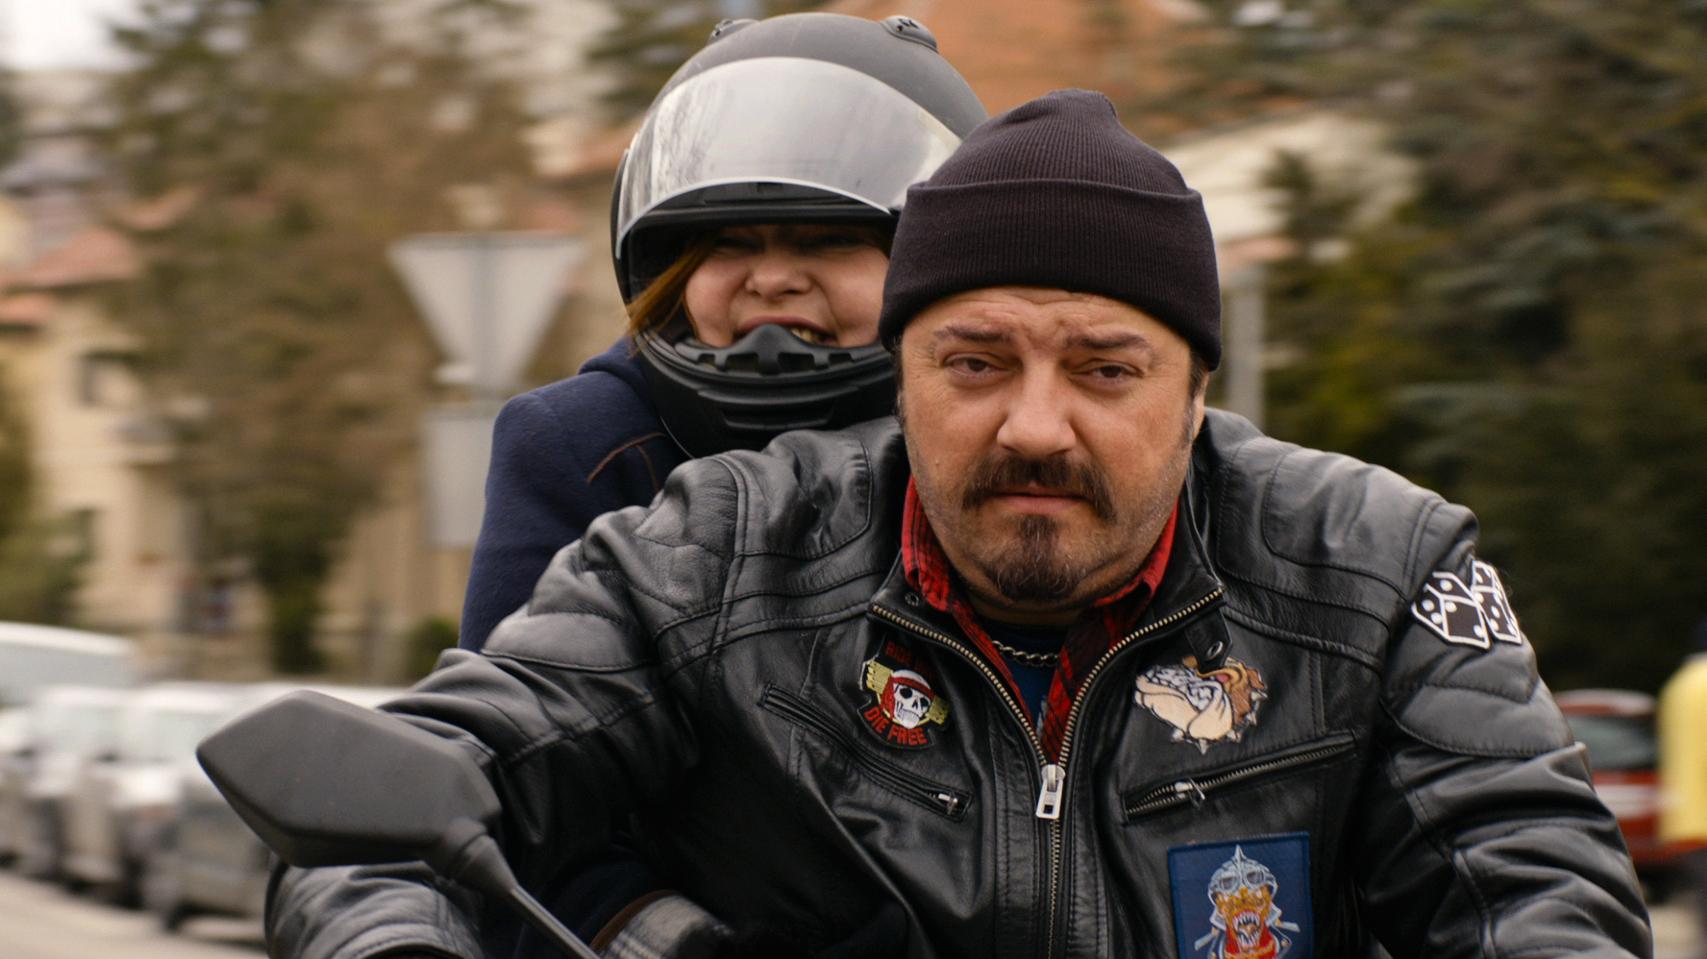 3-sve-najbolje-goran-navojec-ksenija-marinkovic.bin